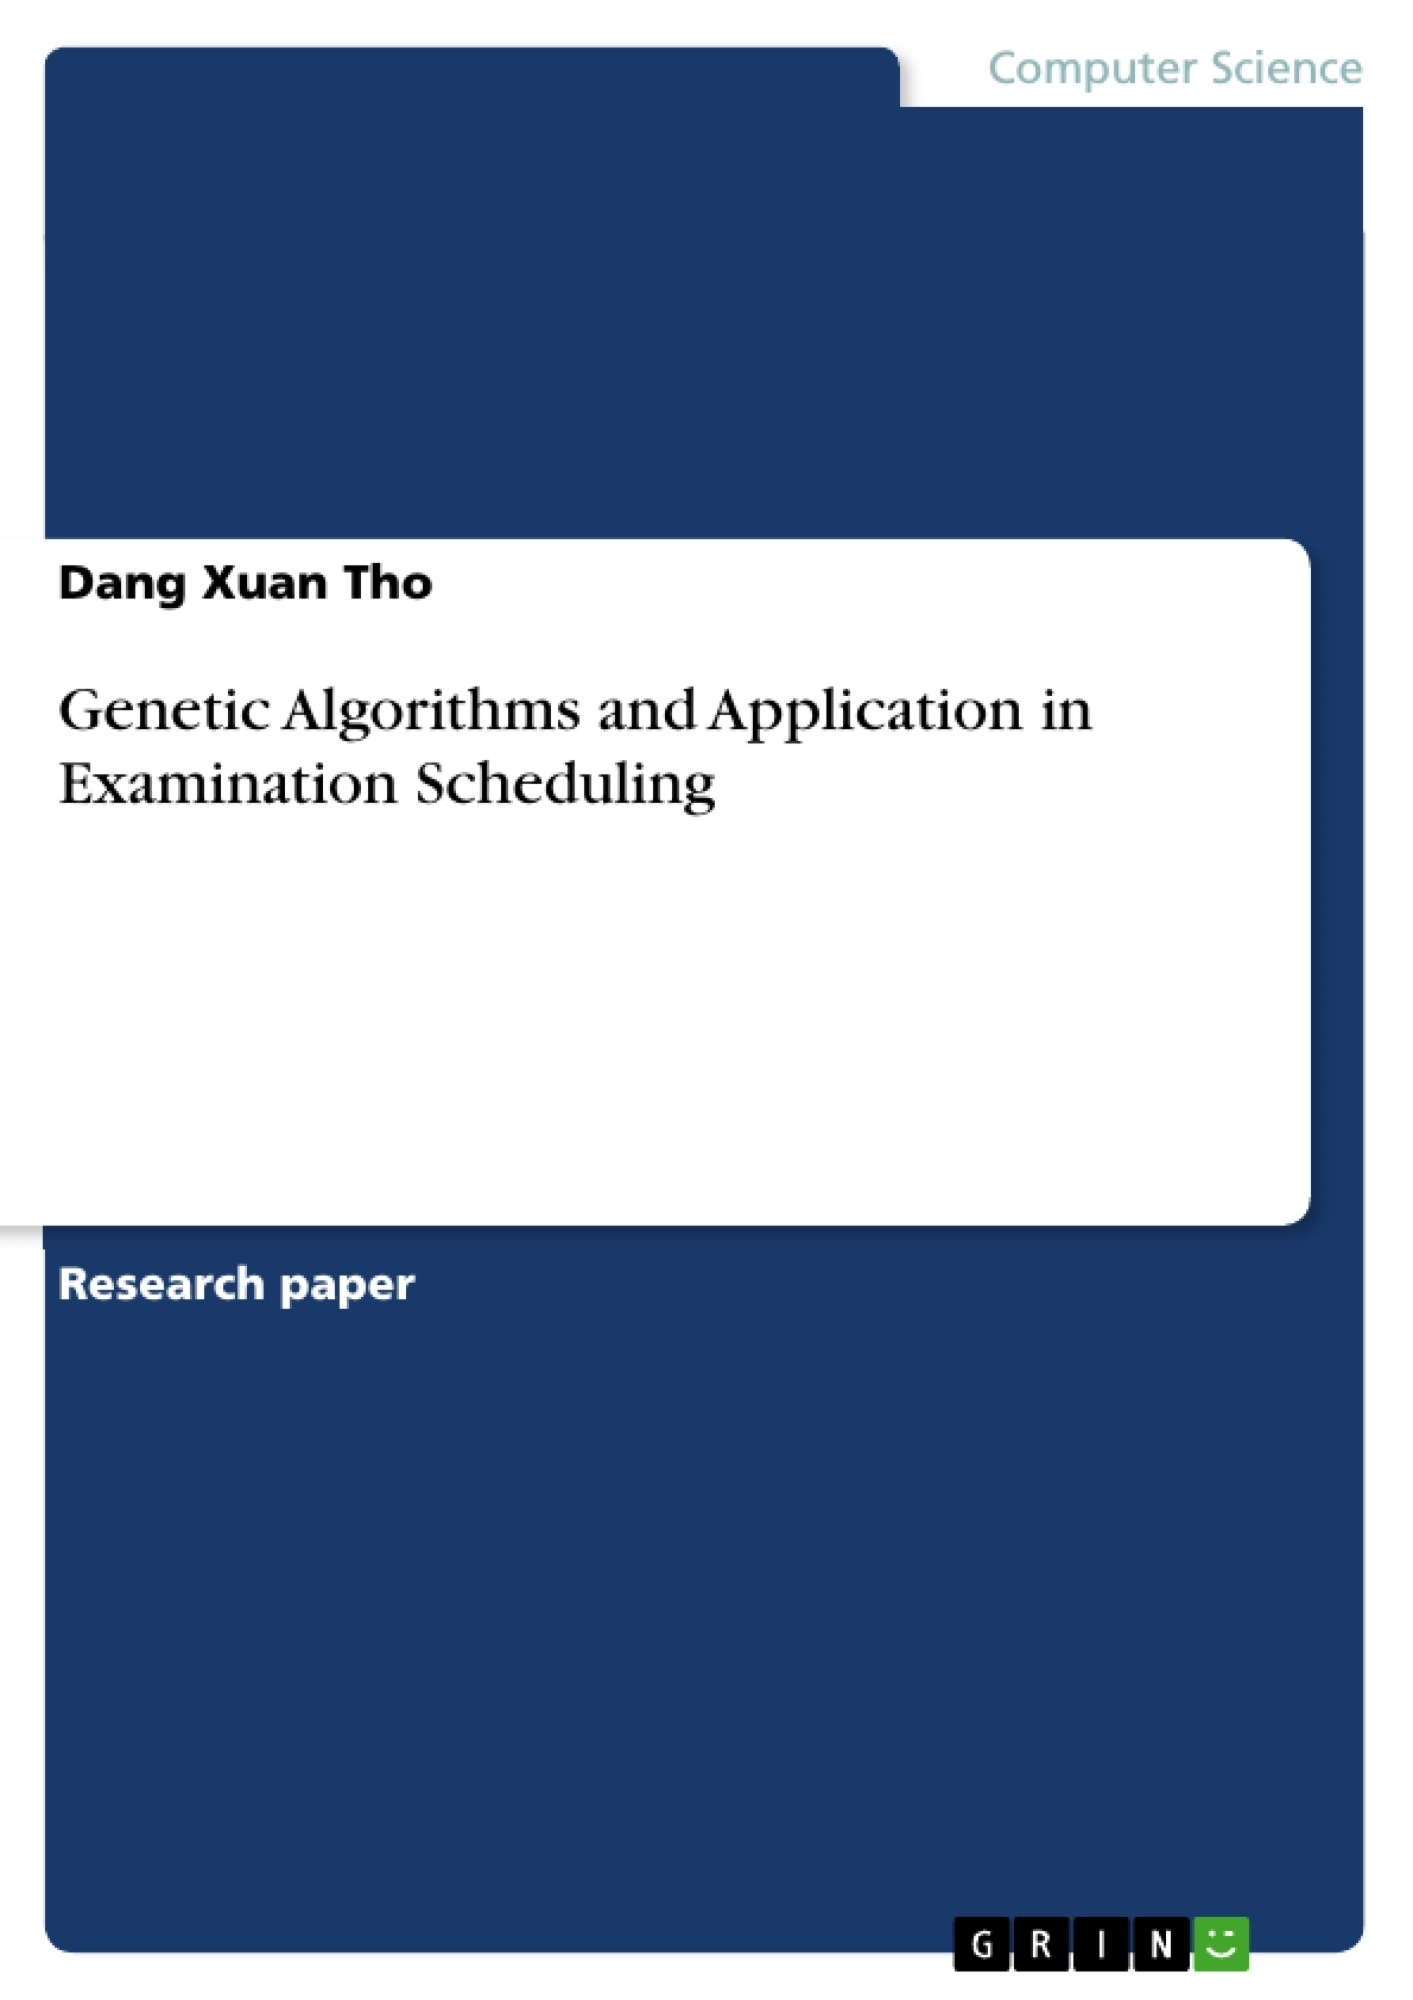 External conflict essay - phd thesis genetic algorithm